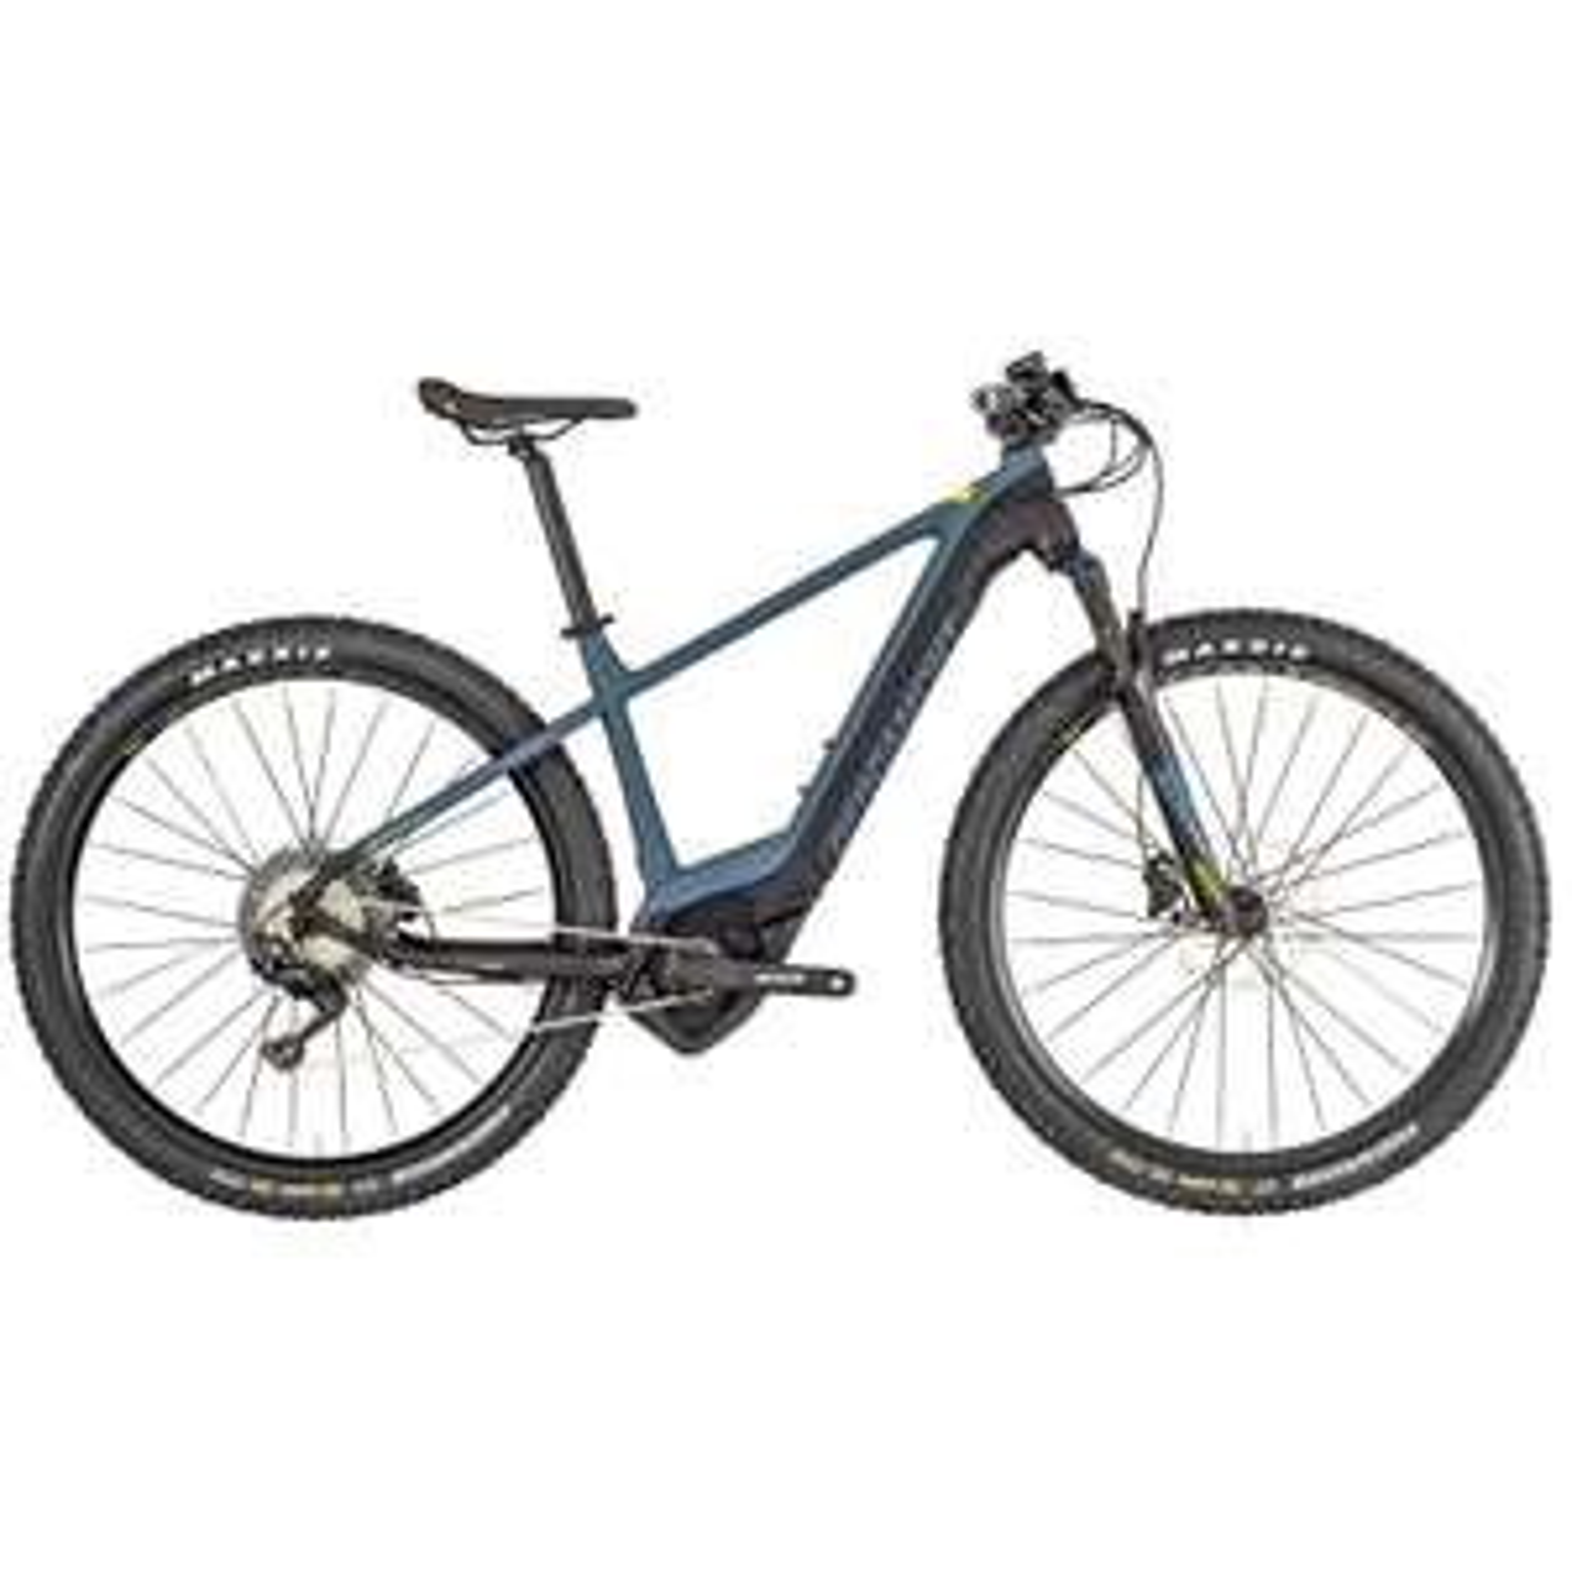 Bergamont E-Revox Expert 29 2019 E-Bike (bikeexchange.de)